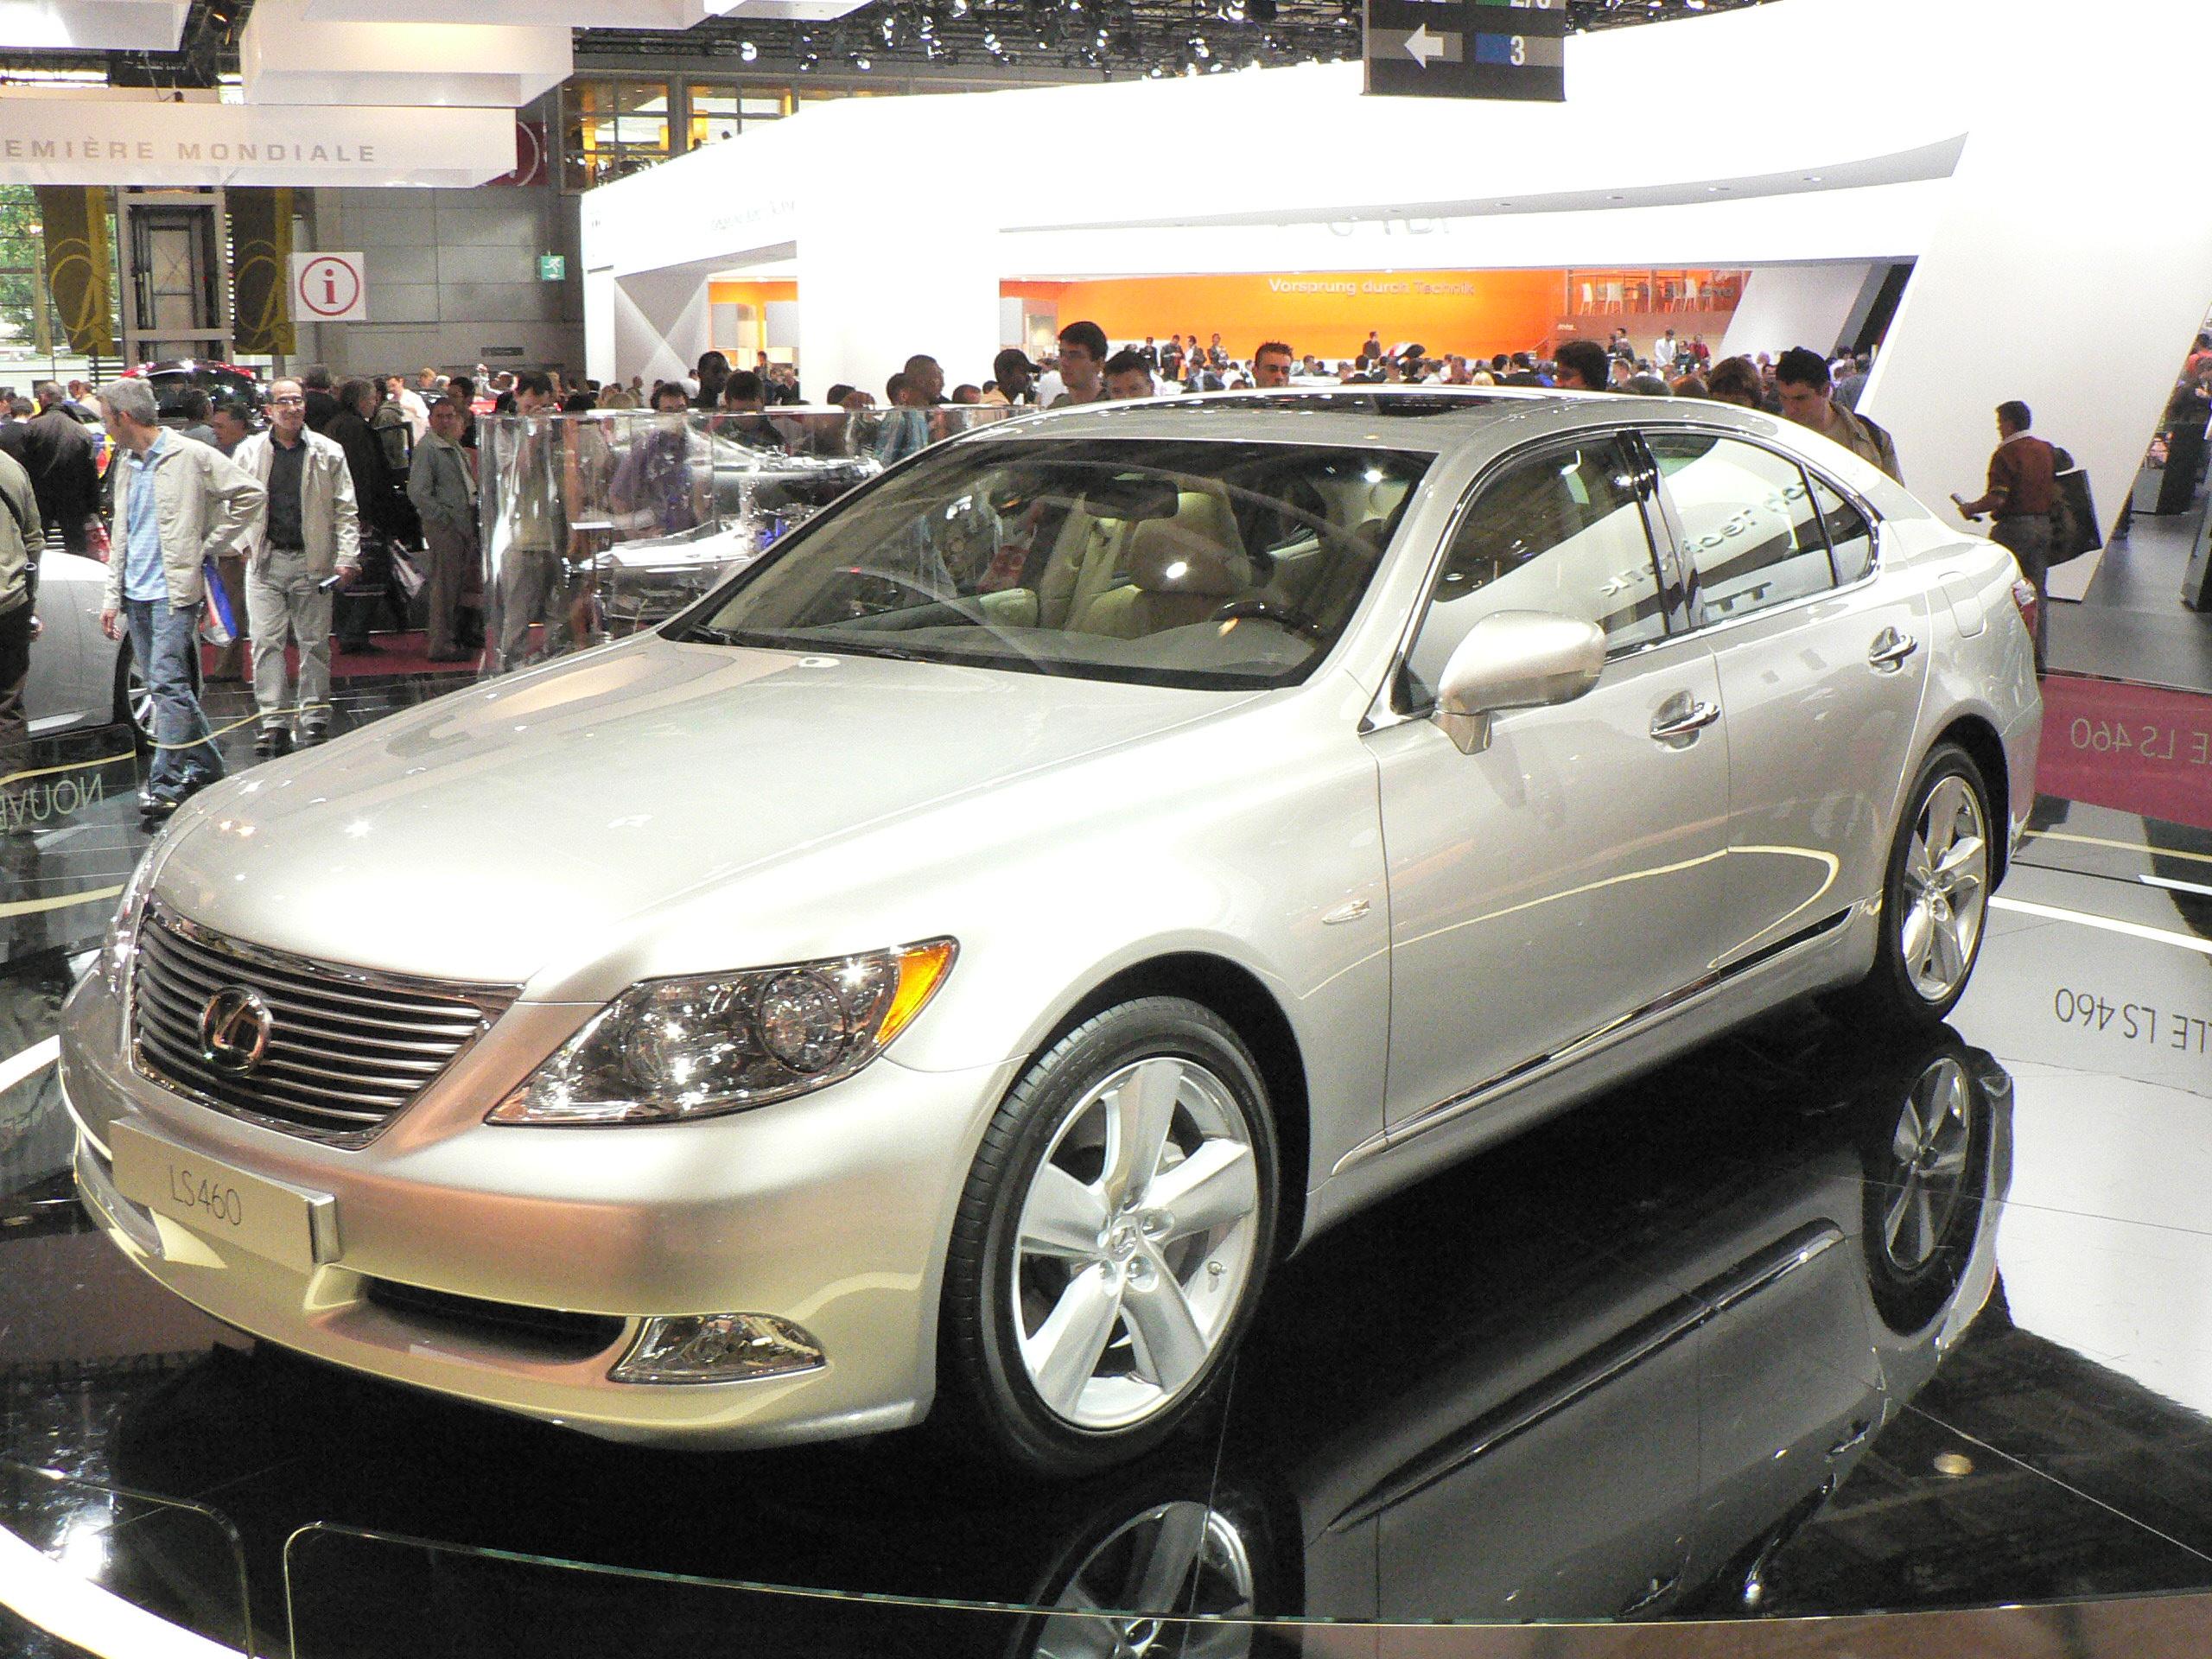 2006 Lexus LS 460